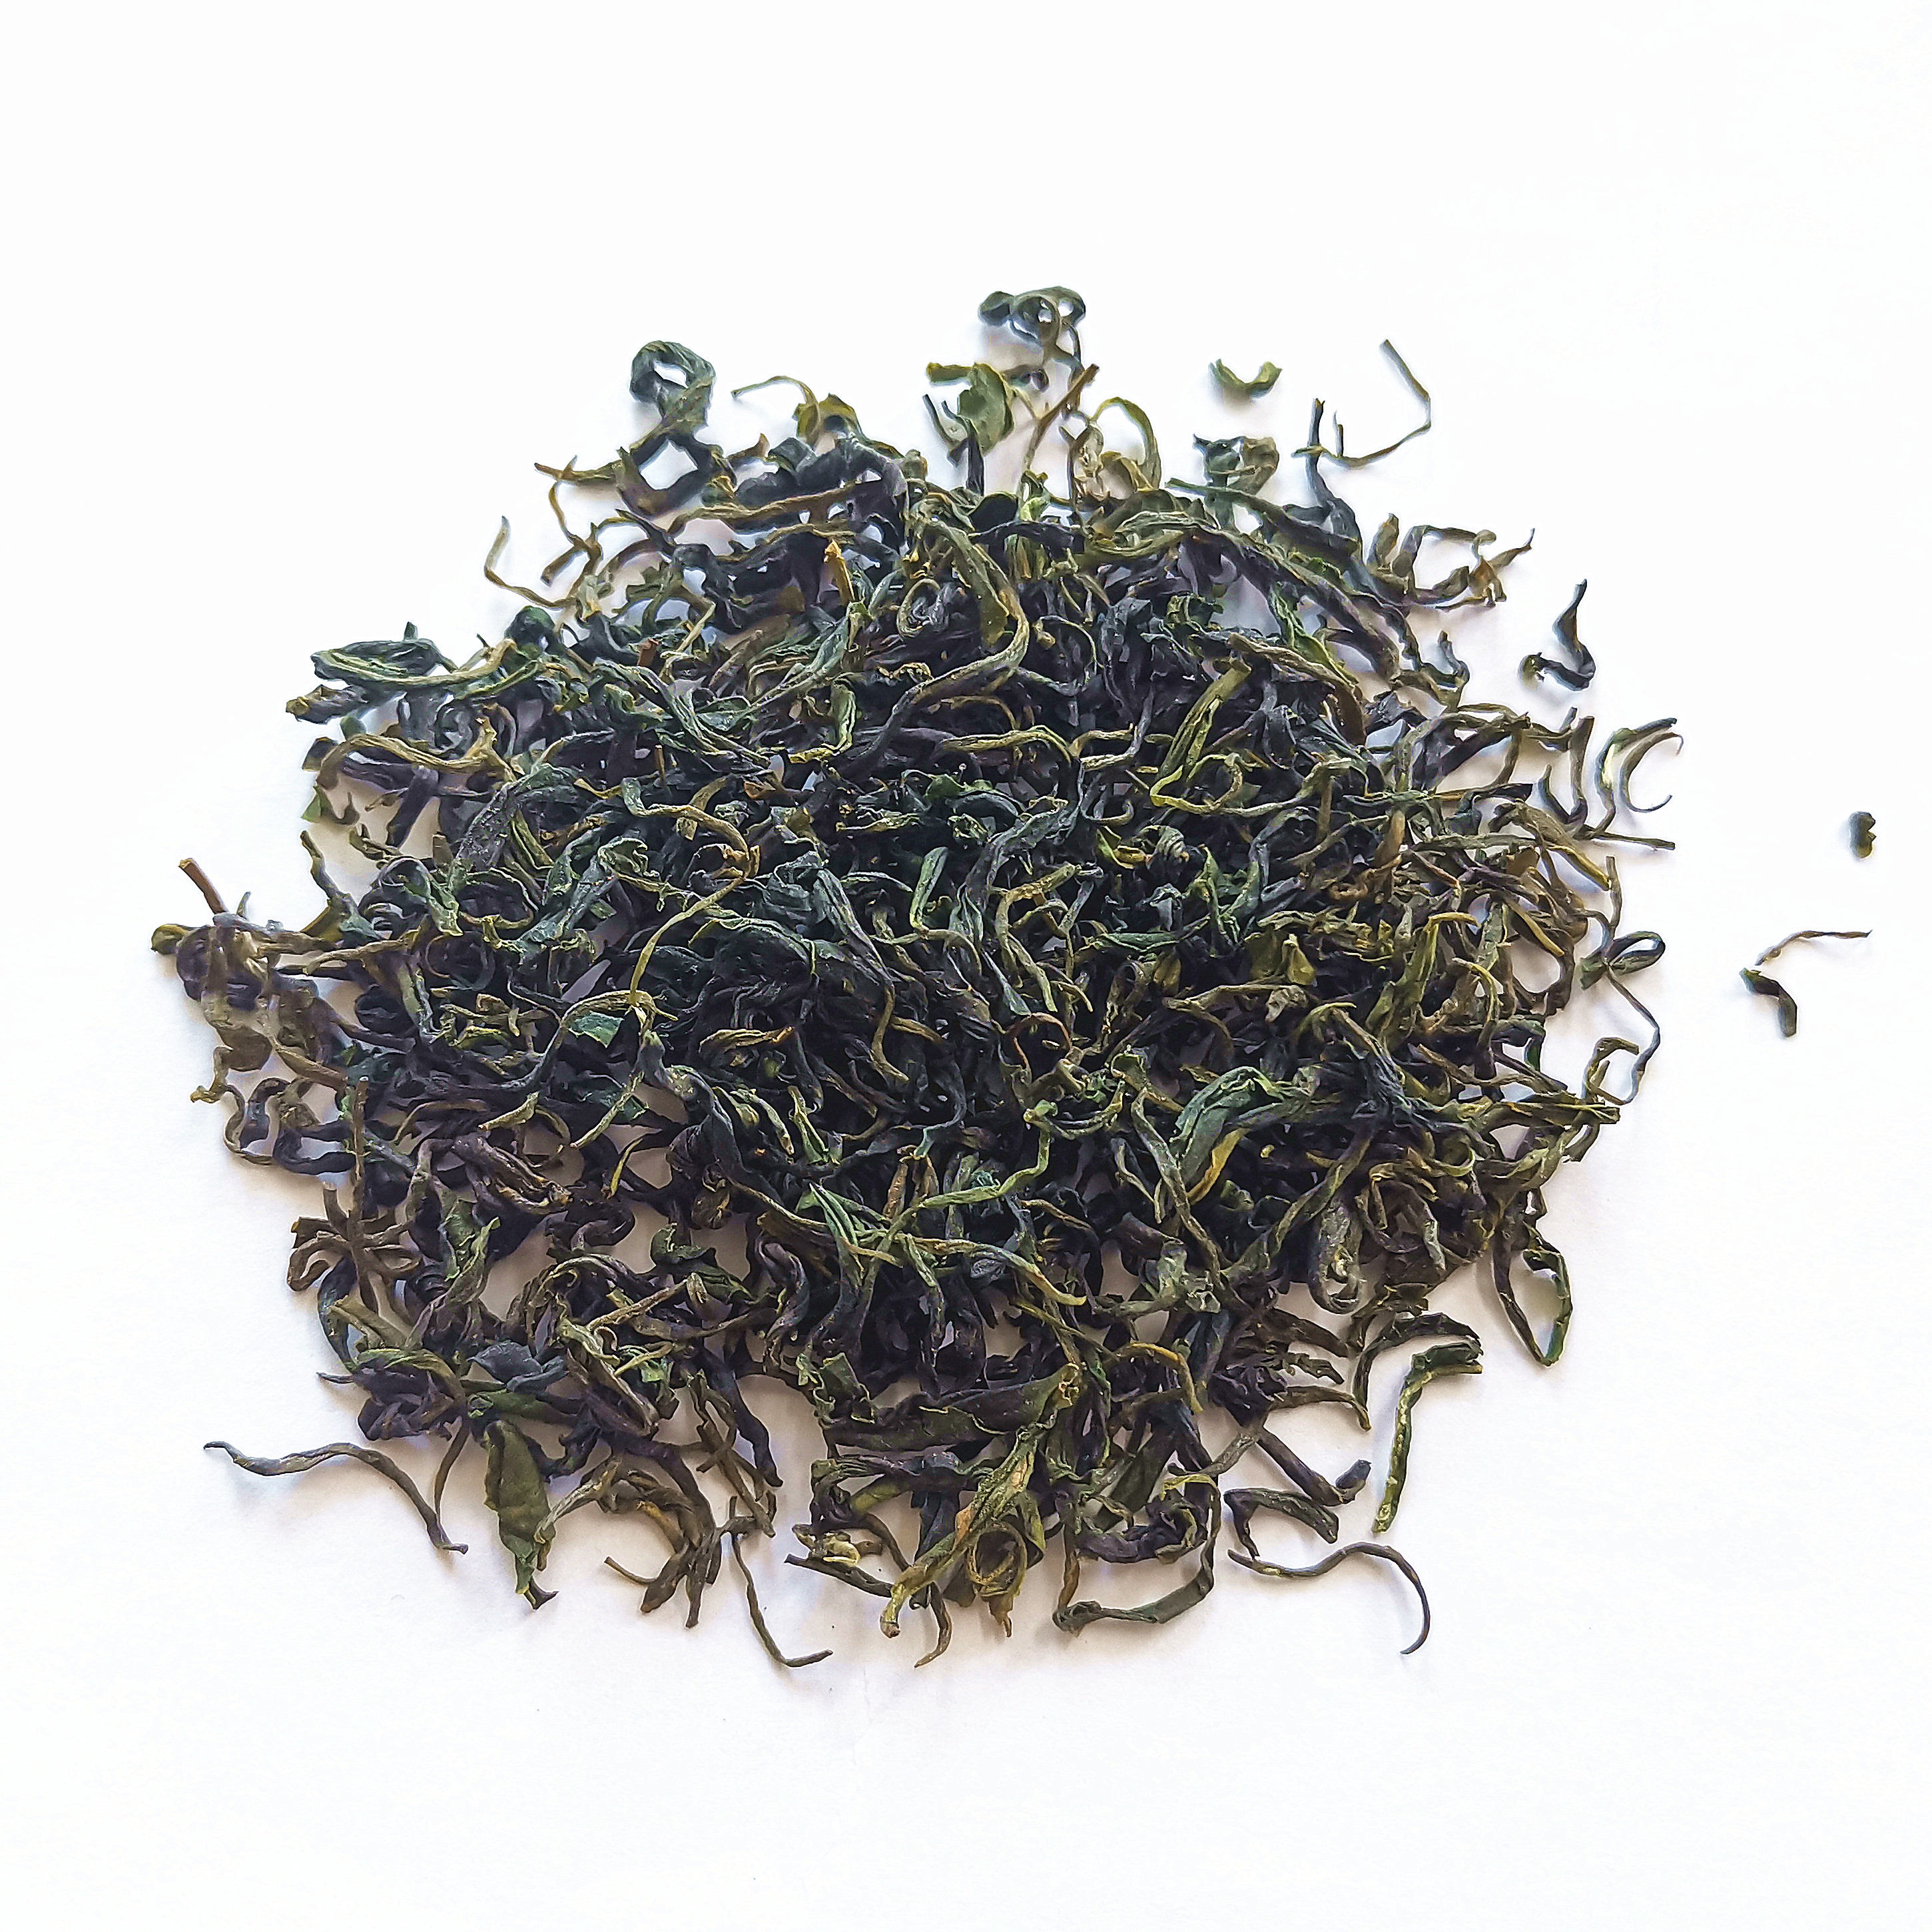 Online tea store loose leaf instant tea green - 4uTea | 4uTea.com